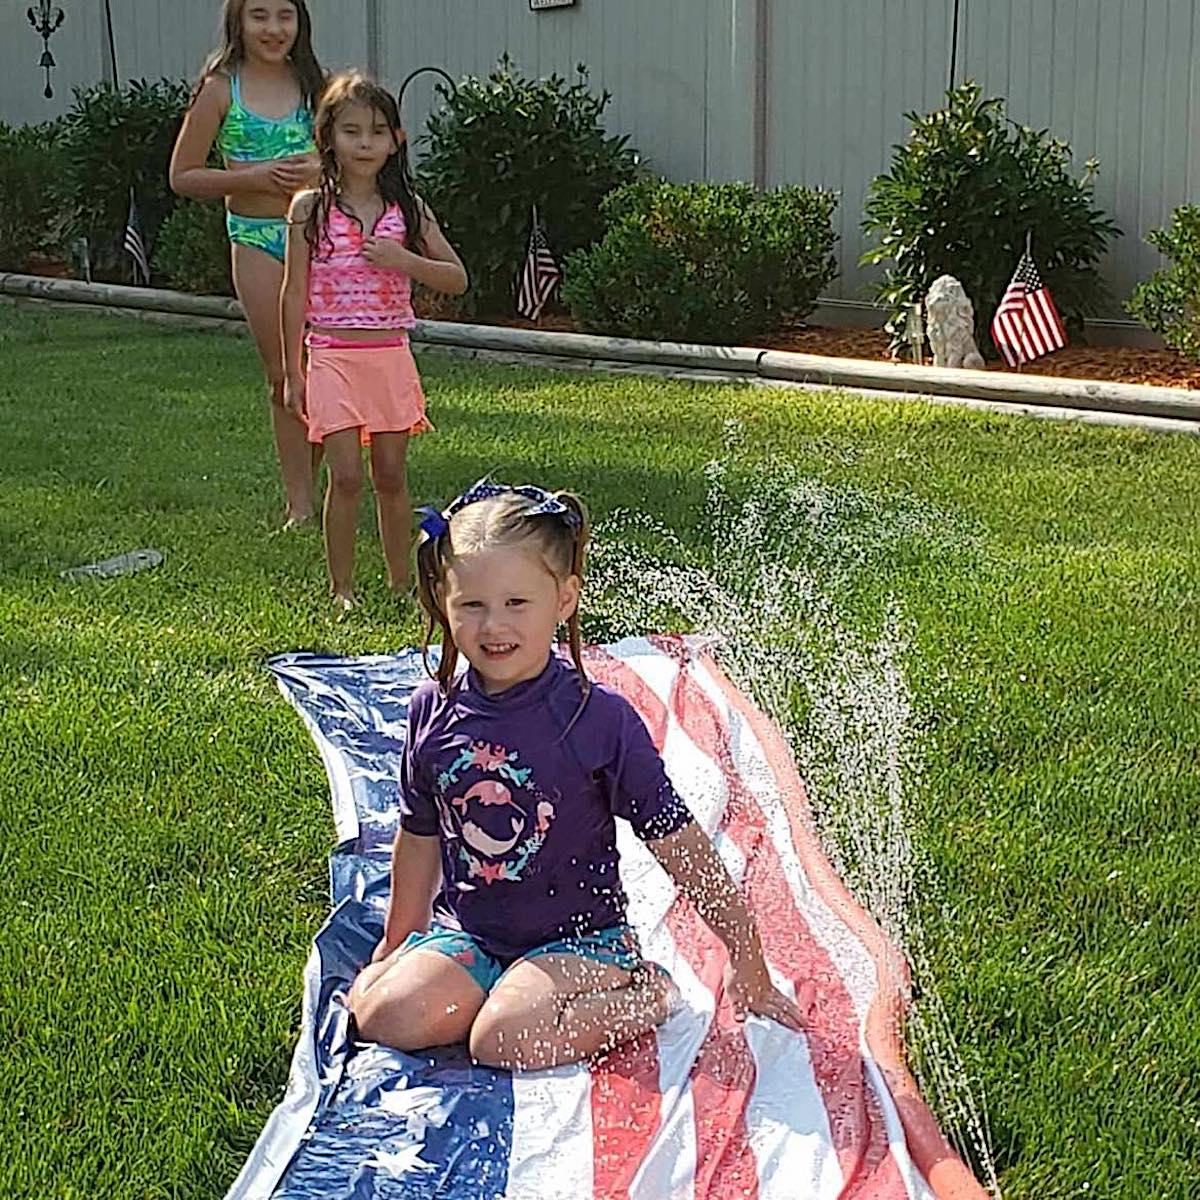 Summer Fun Stars snd Stripes Water Slide